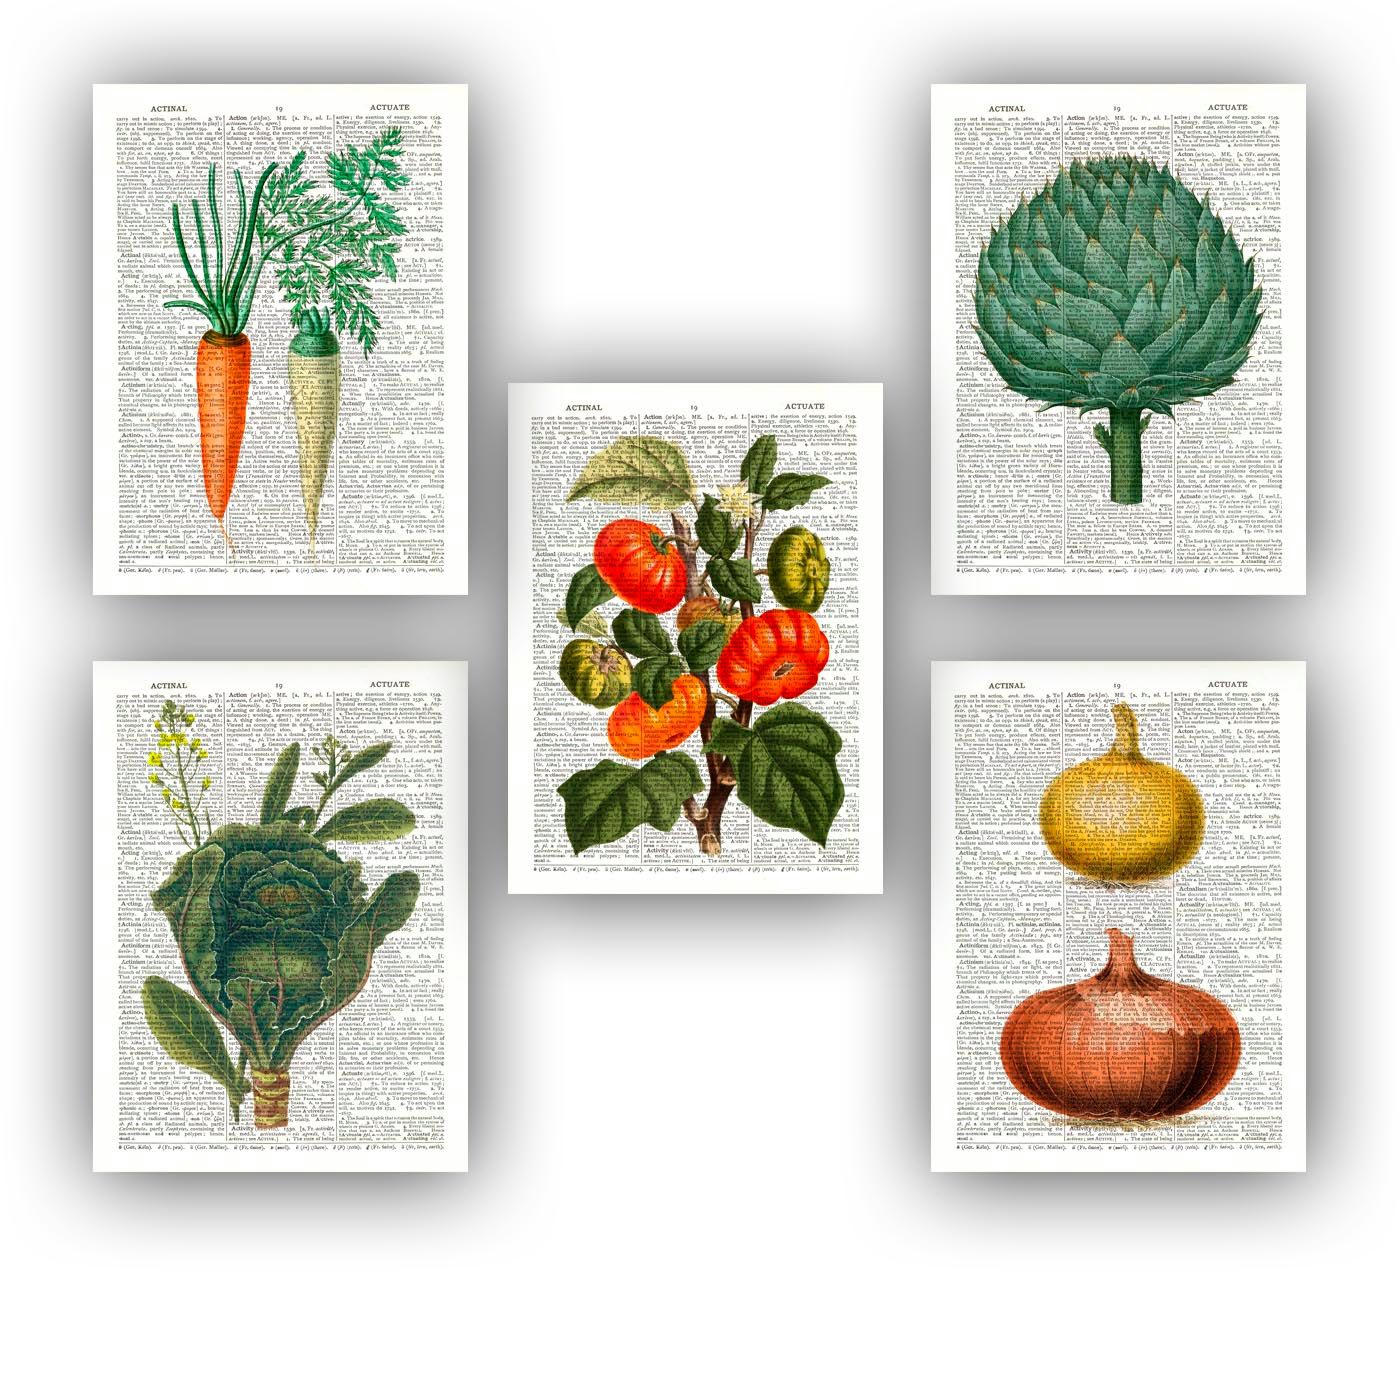 Kitchen Wall Art, Kitchen Poster, Vegetables Art, Kitchen Decor, Kitchen  Wall Prints, Kitchen Art, Home Decor Art, Kitchen Artwork